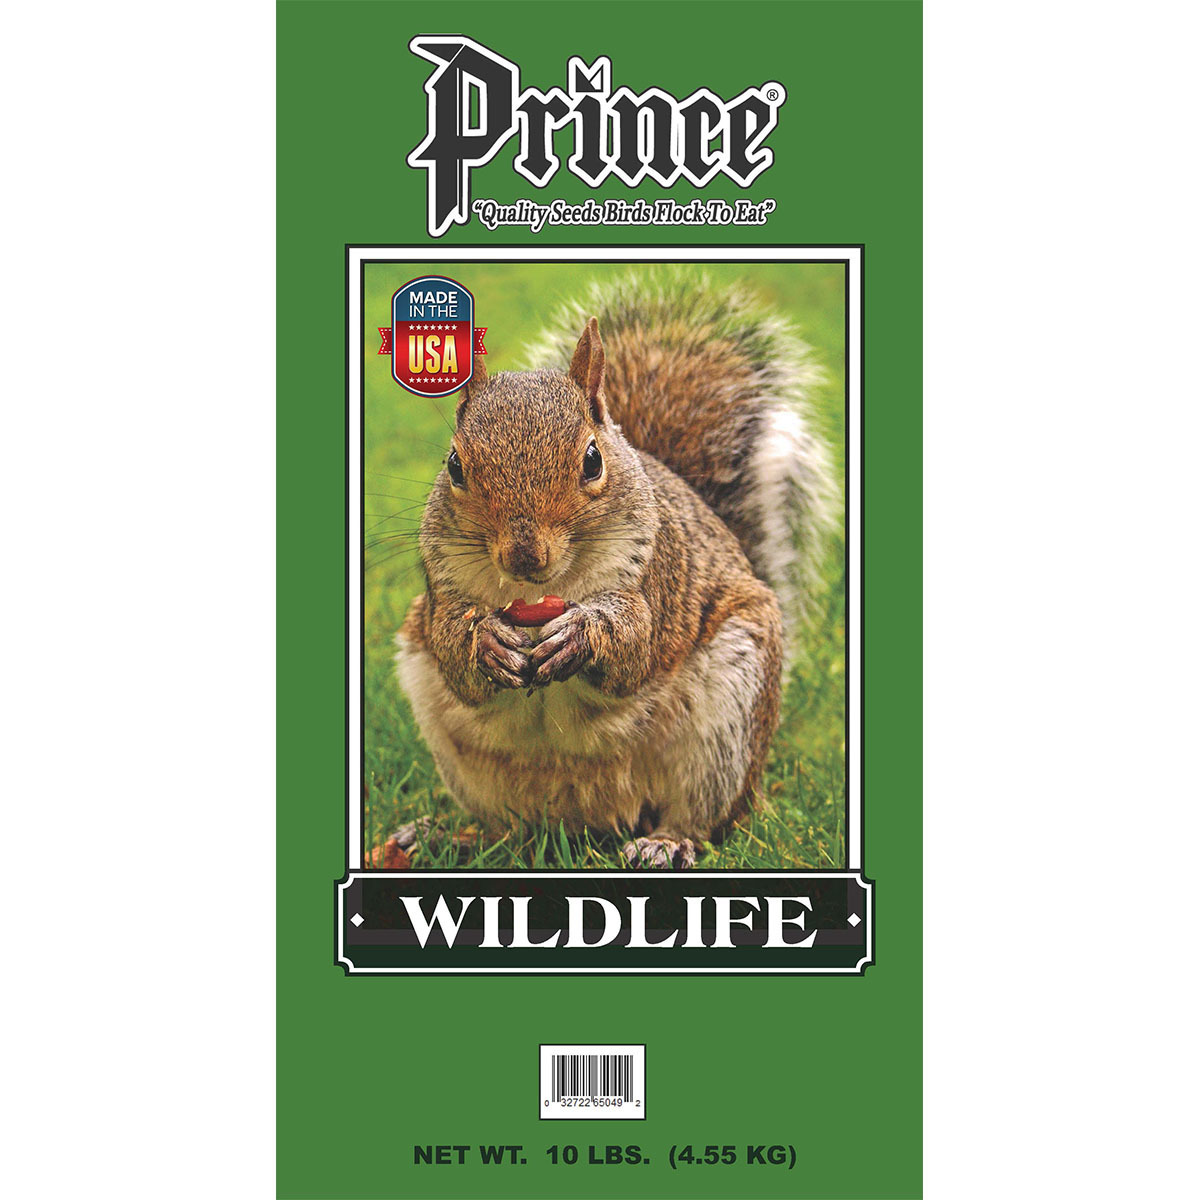 Prince Wildlife Formula Wild Bird Food, 10-lb